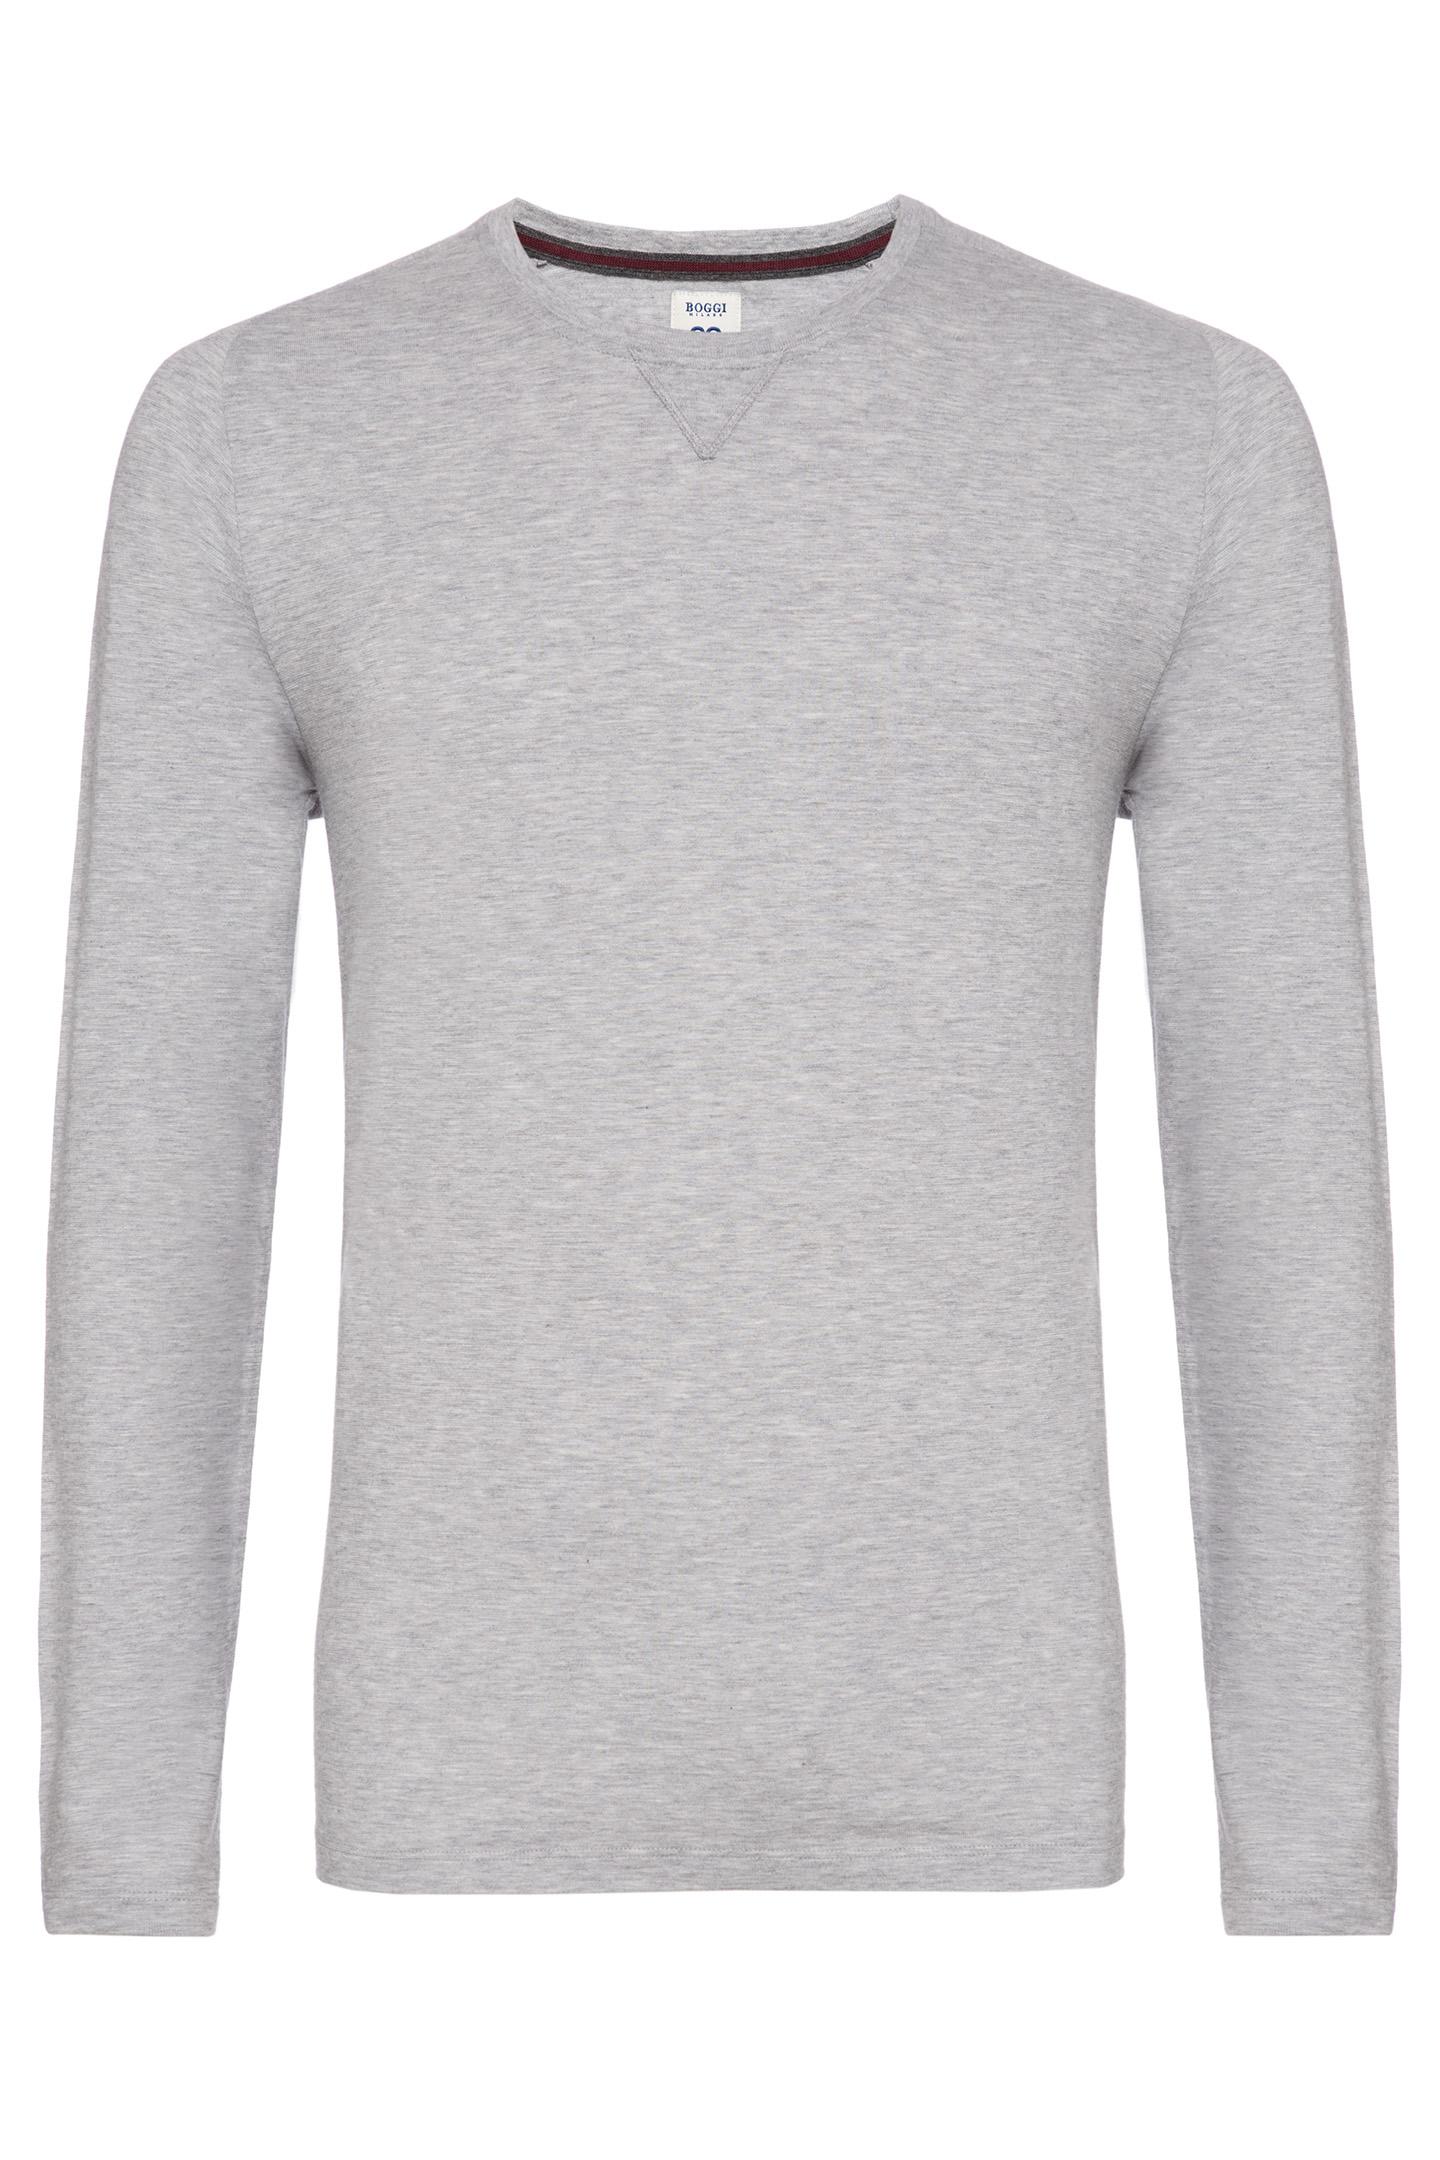 Shot Cotton Jersey T Shirt Custom Fit Boggi